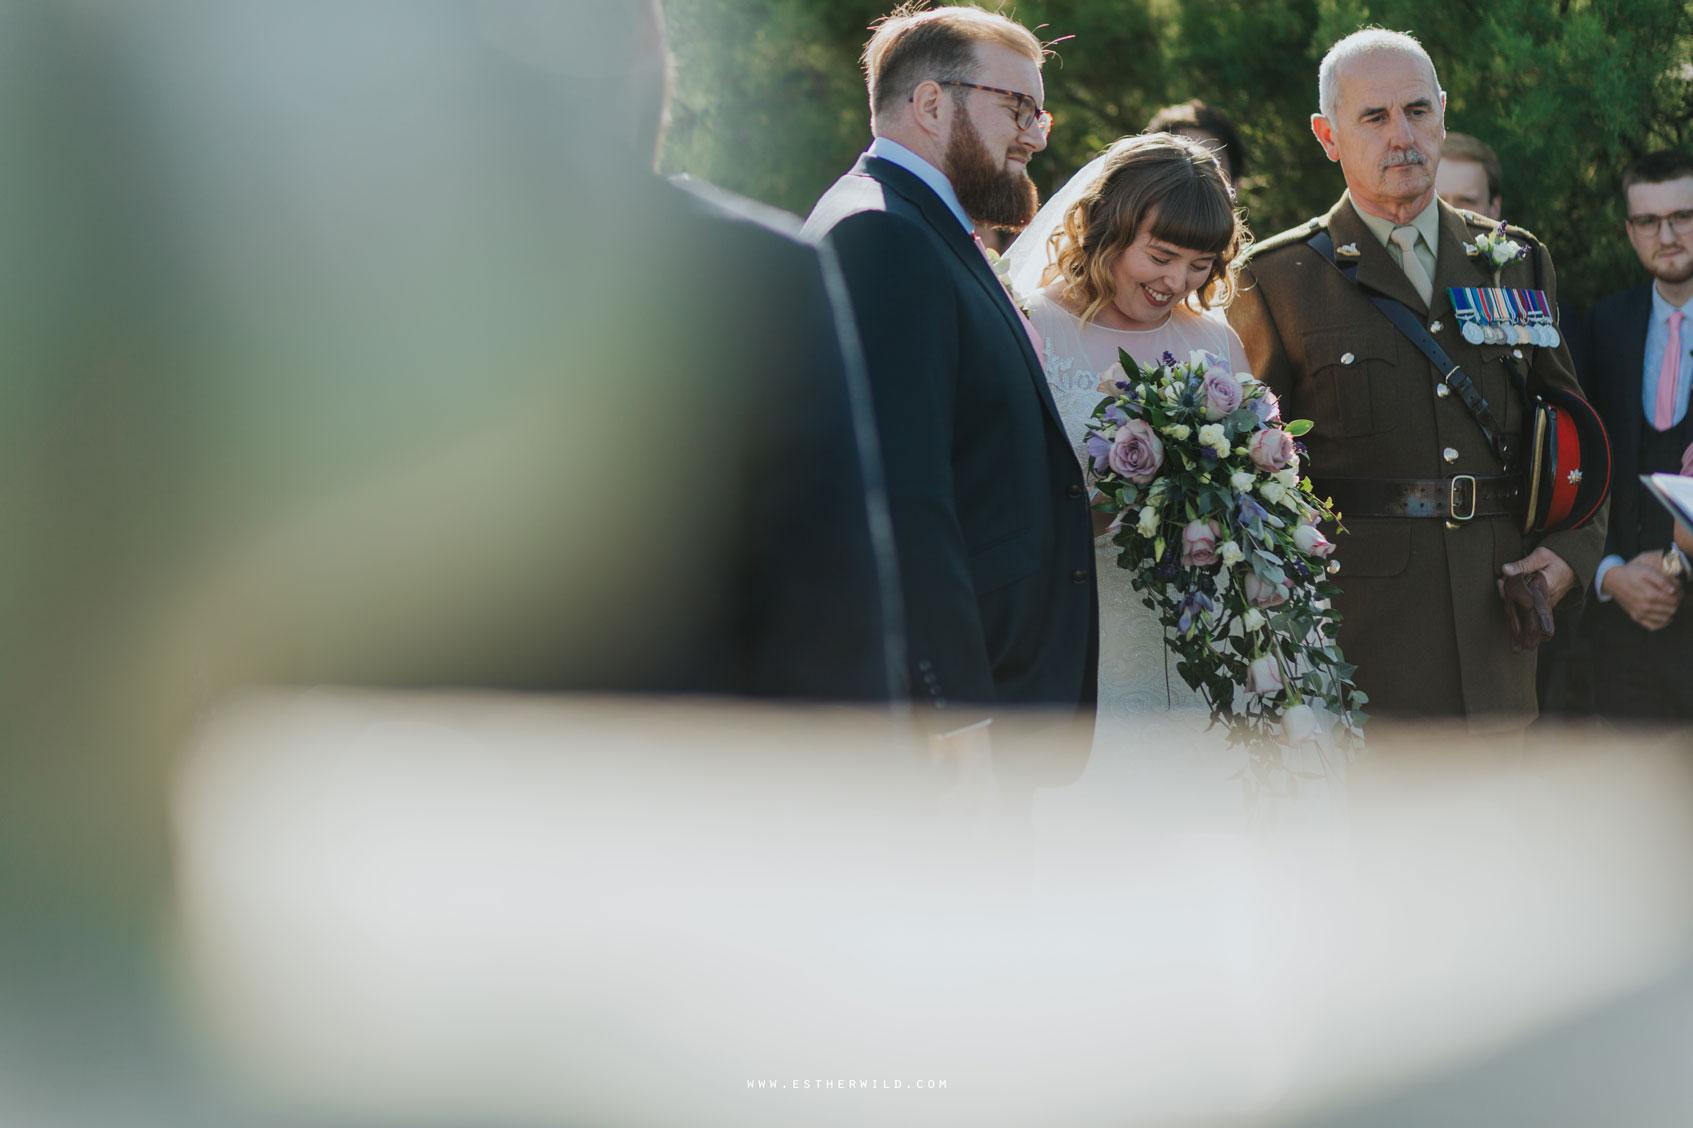 Cromer_Wedding_Beach_Outdoor_Ceremony_Norfolk_North_Lodge_Registry_Office_Rocket_House_Cafe_Cromer_Pier_IMG_3721_IMGL7921.jpg